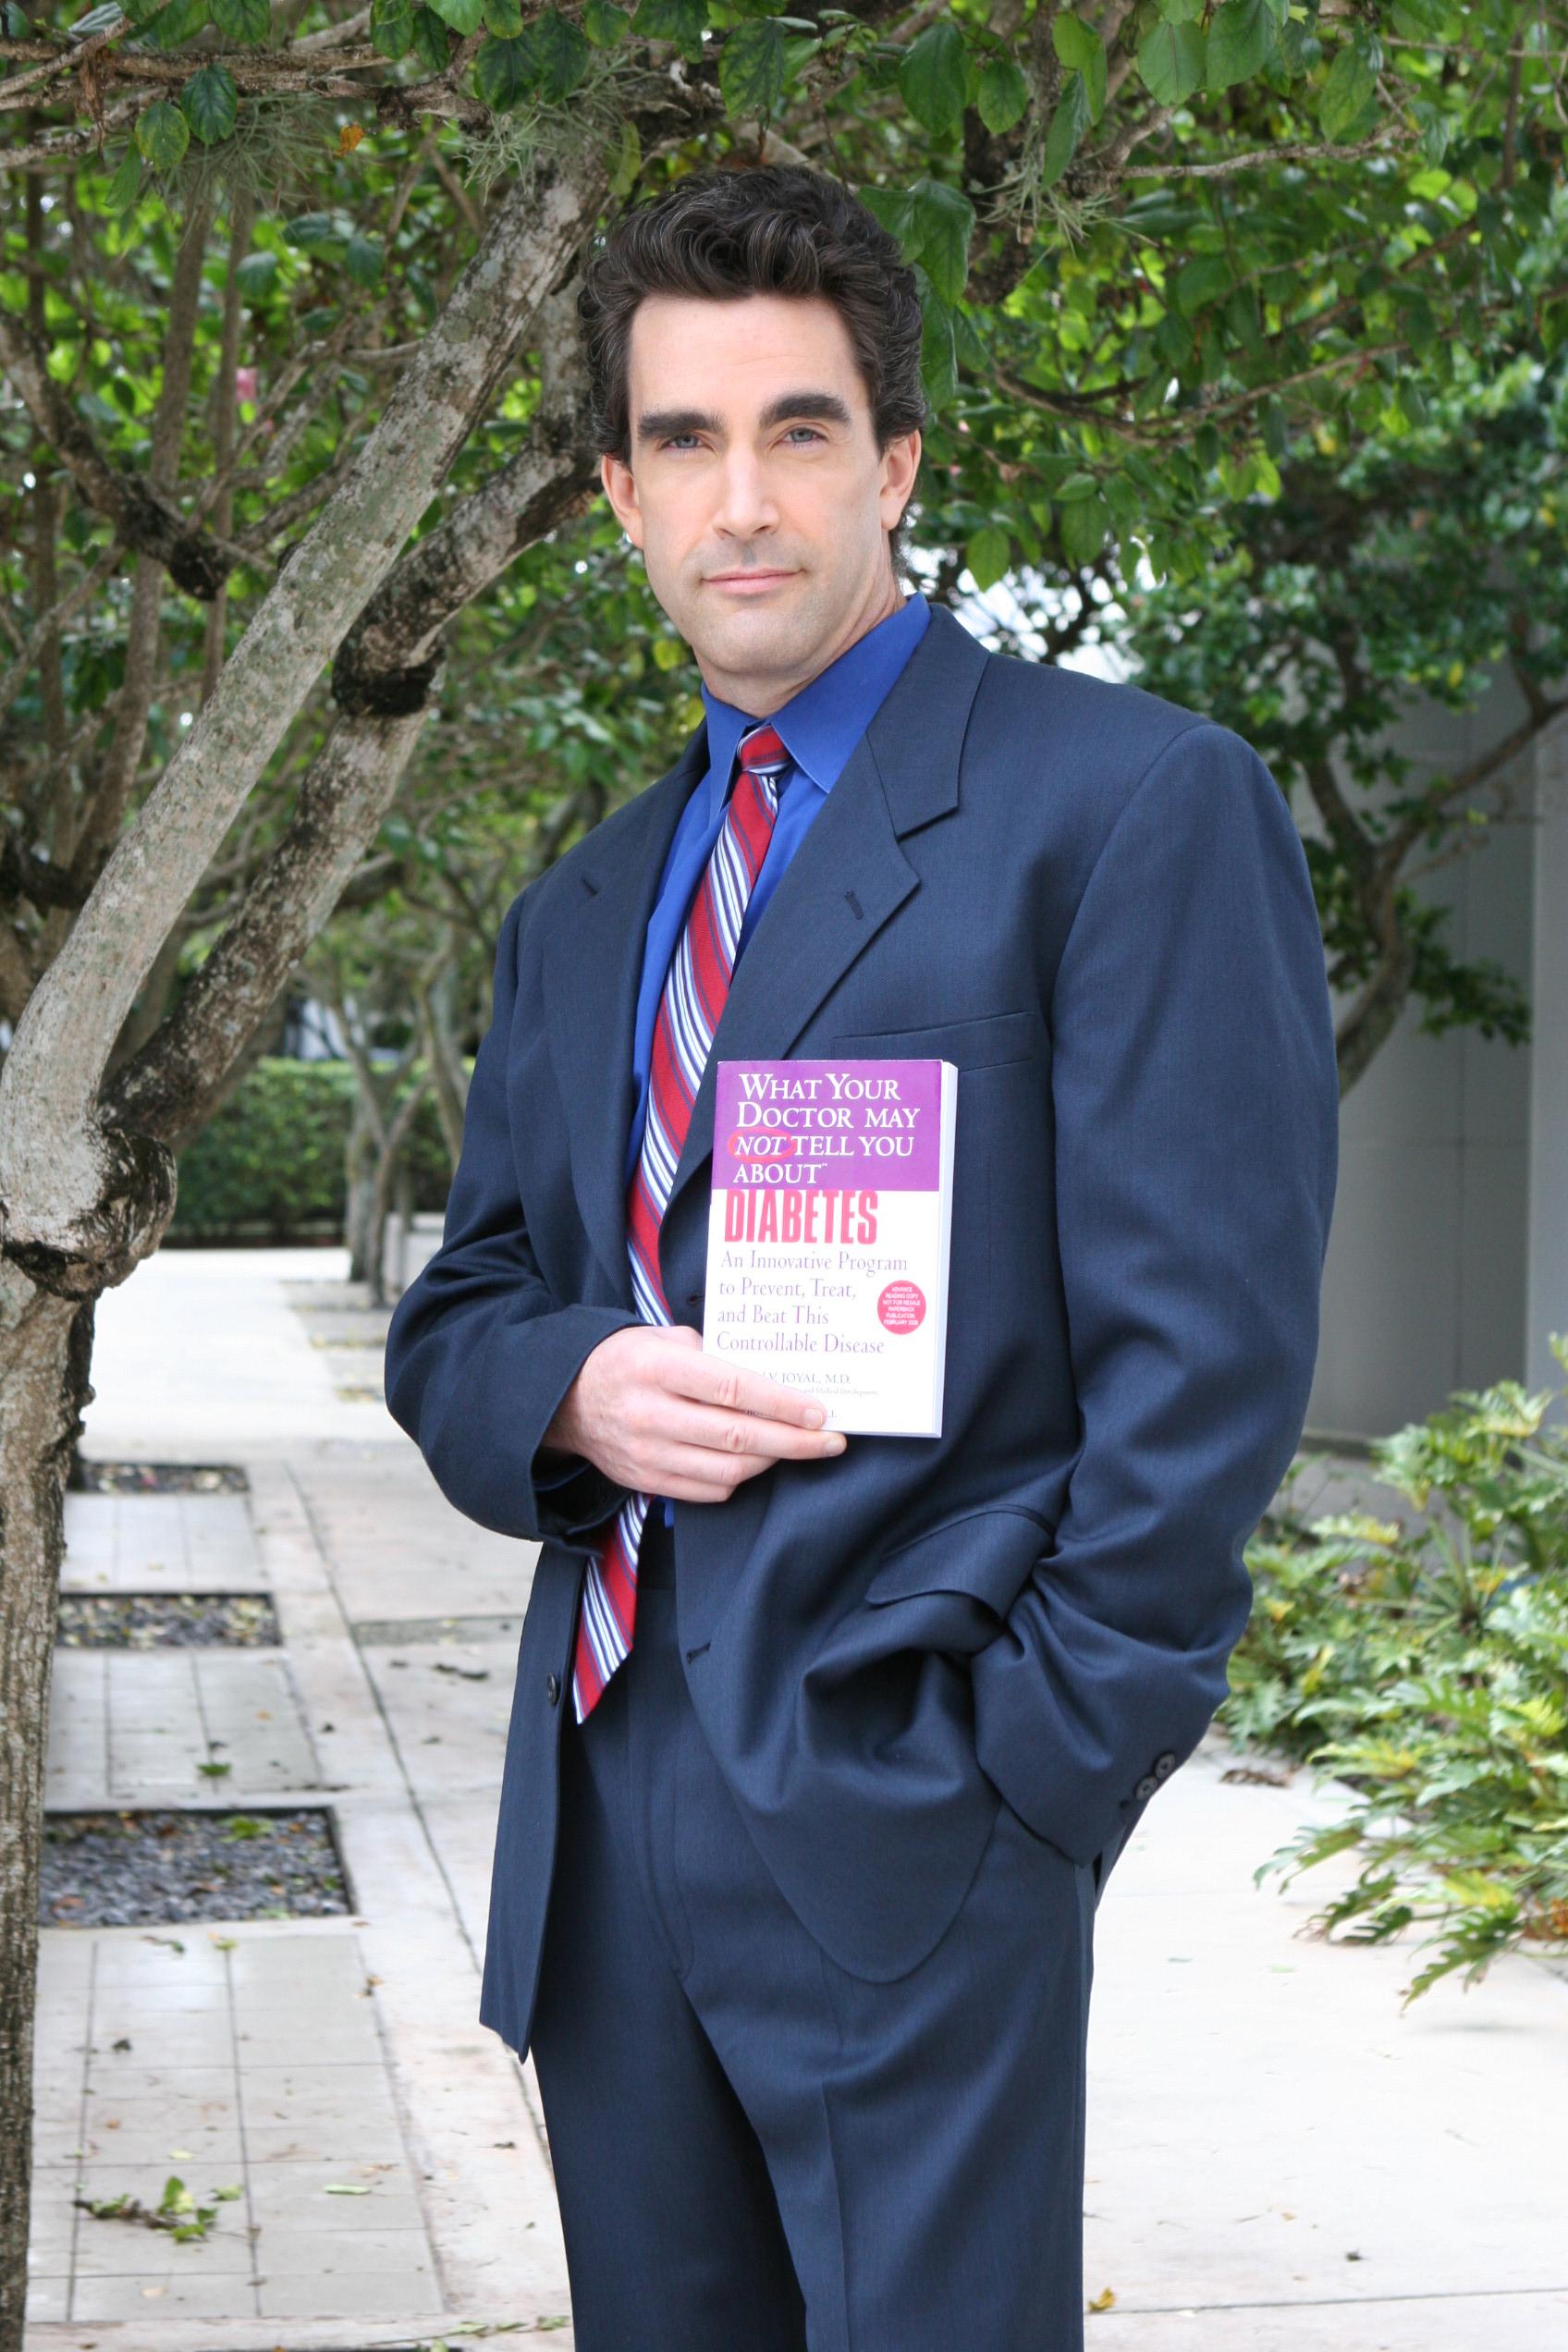 Dr. Steven Joyal